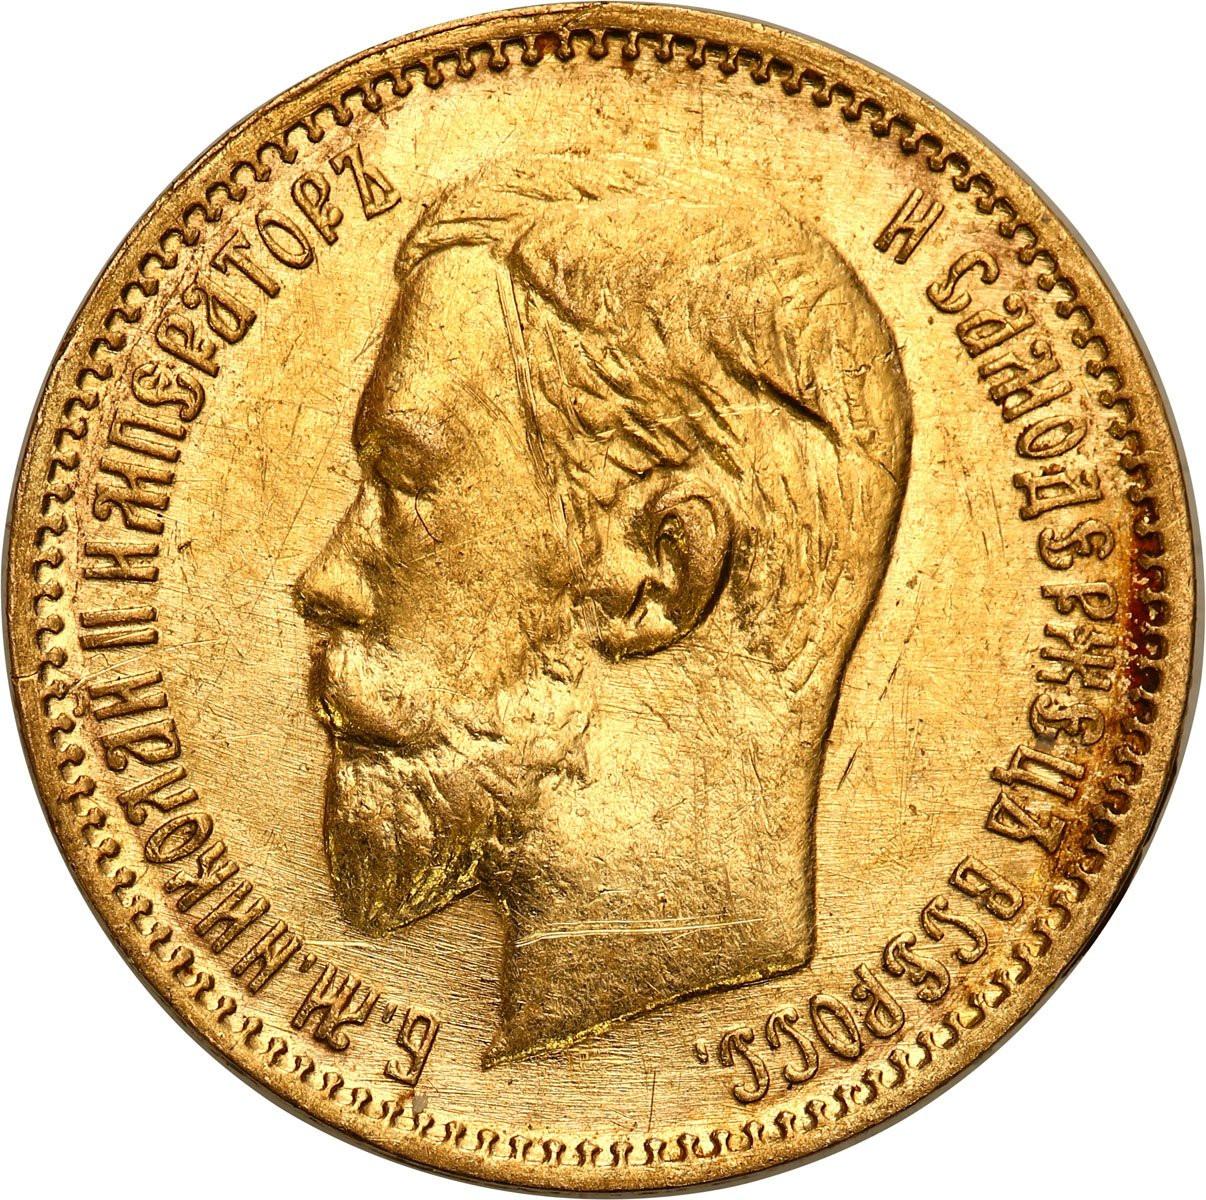 Rosja. Mikołaj II 5 rubli 1904 AP, Petersburg - PIĘKNE